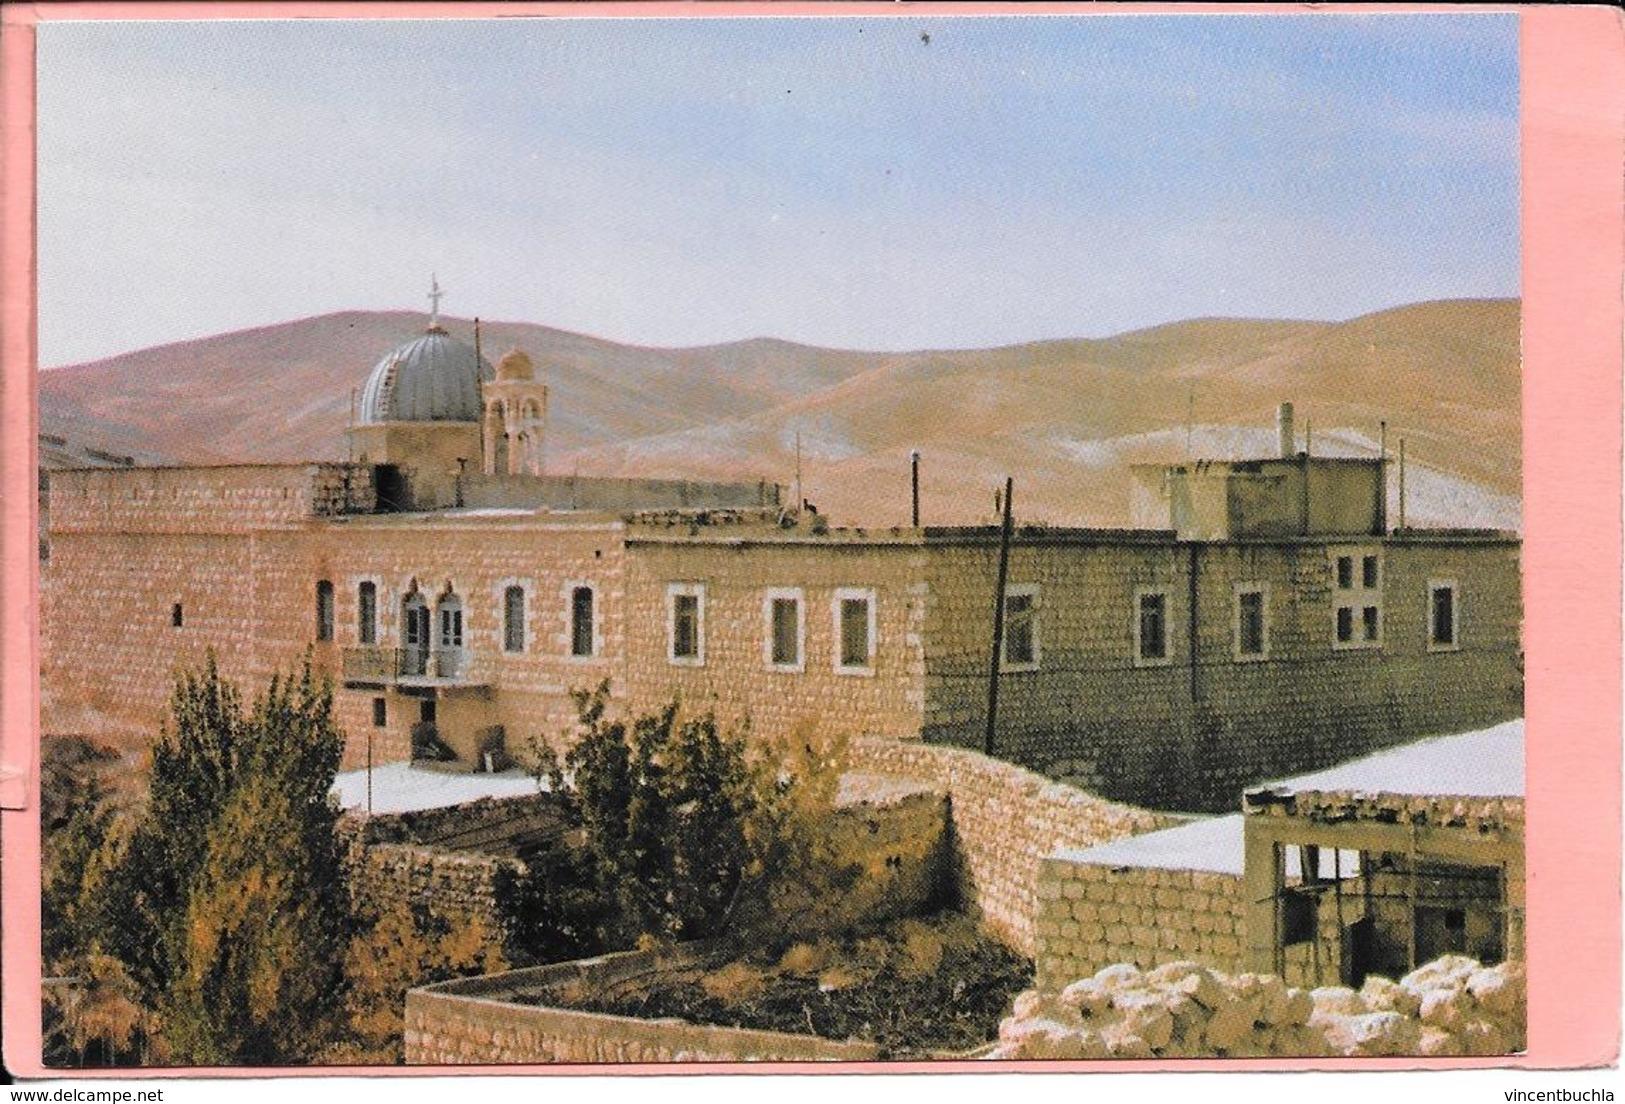 Maloula Syrie Couvent Saint Serge Et Eglise Convent Ma'lula Monastery Church Syria Parfait état - Syrie